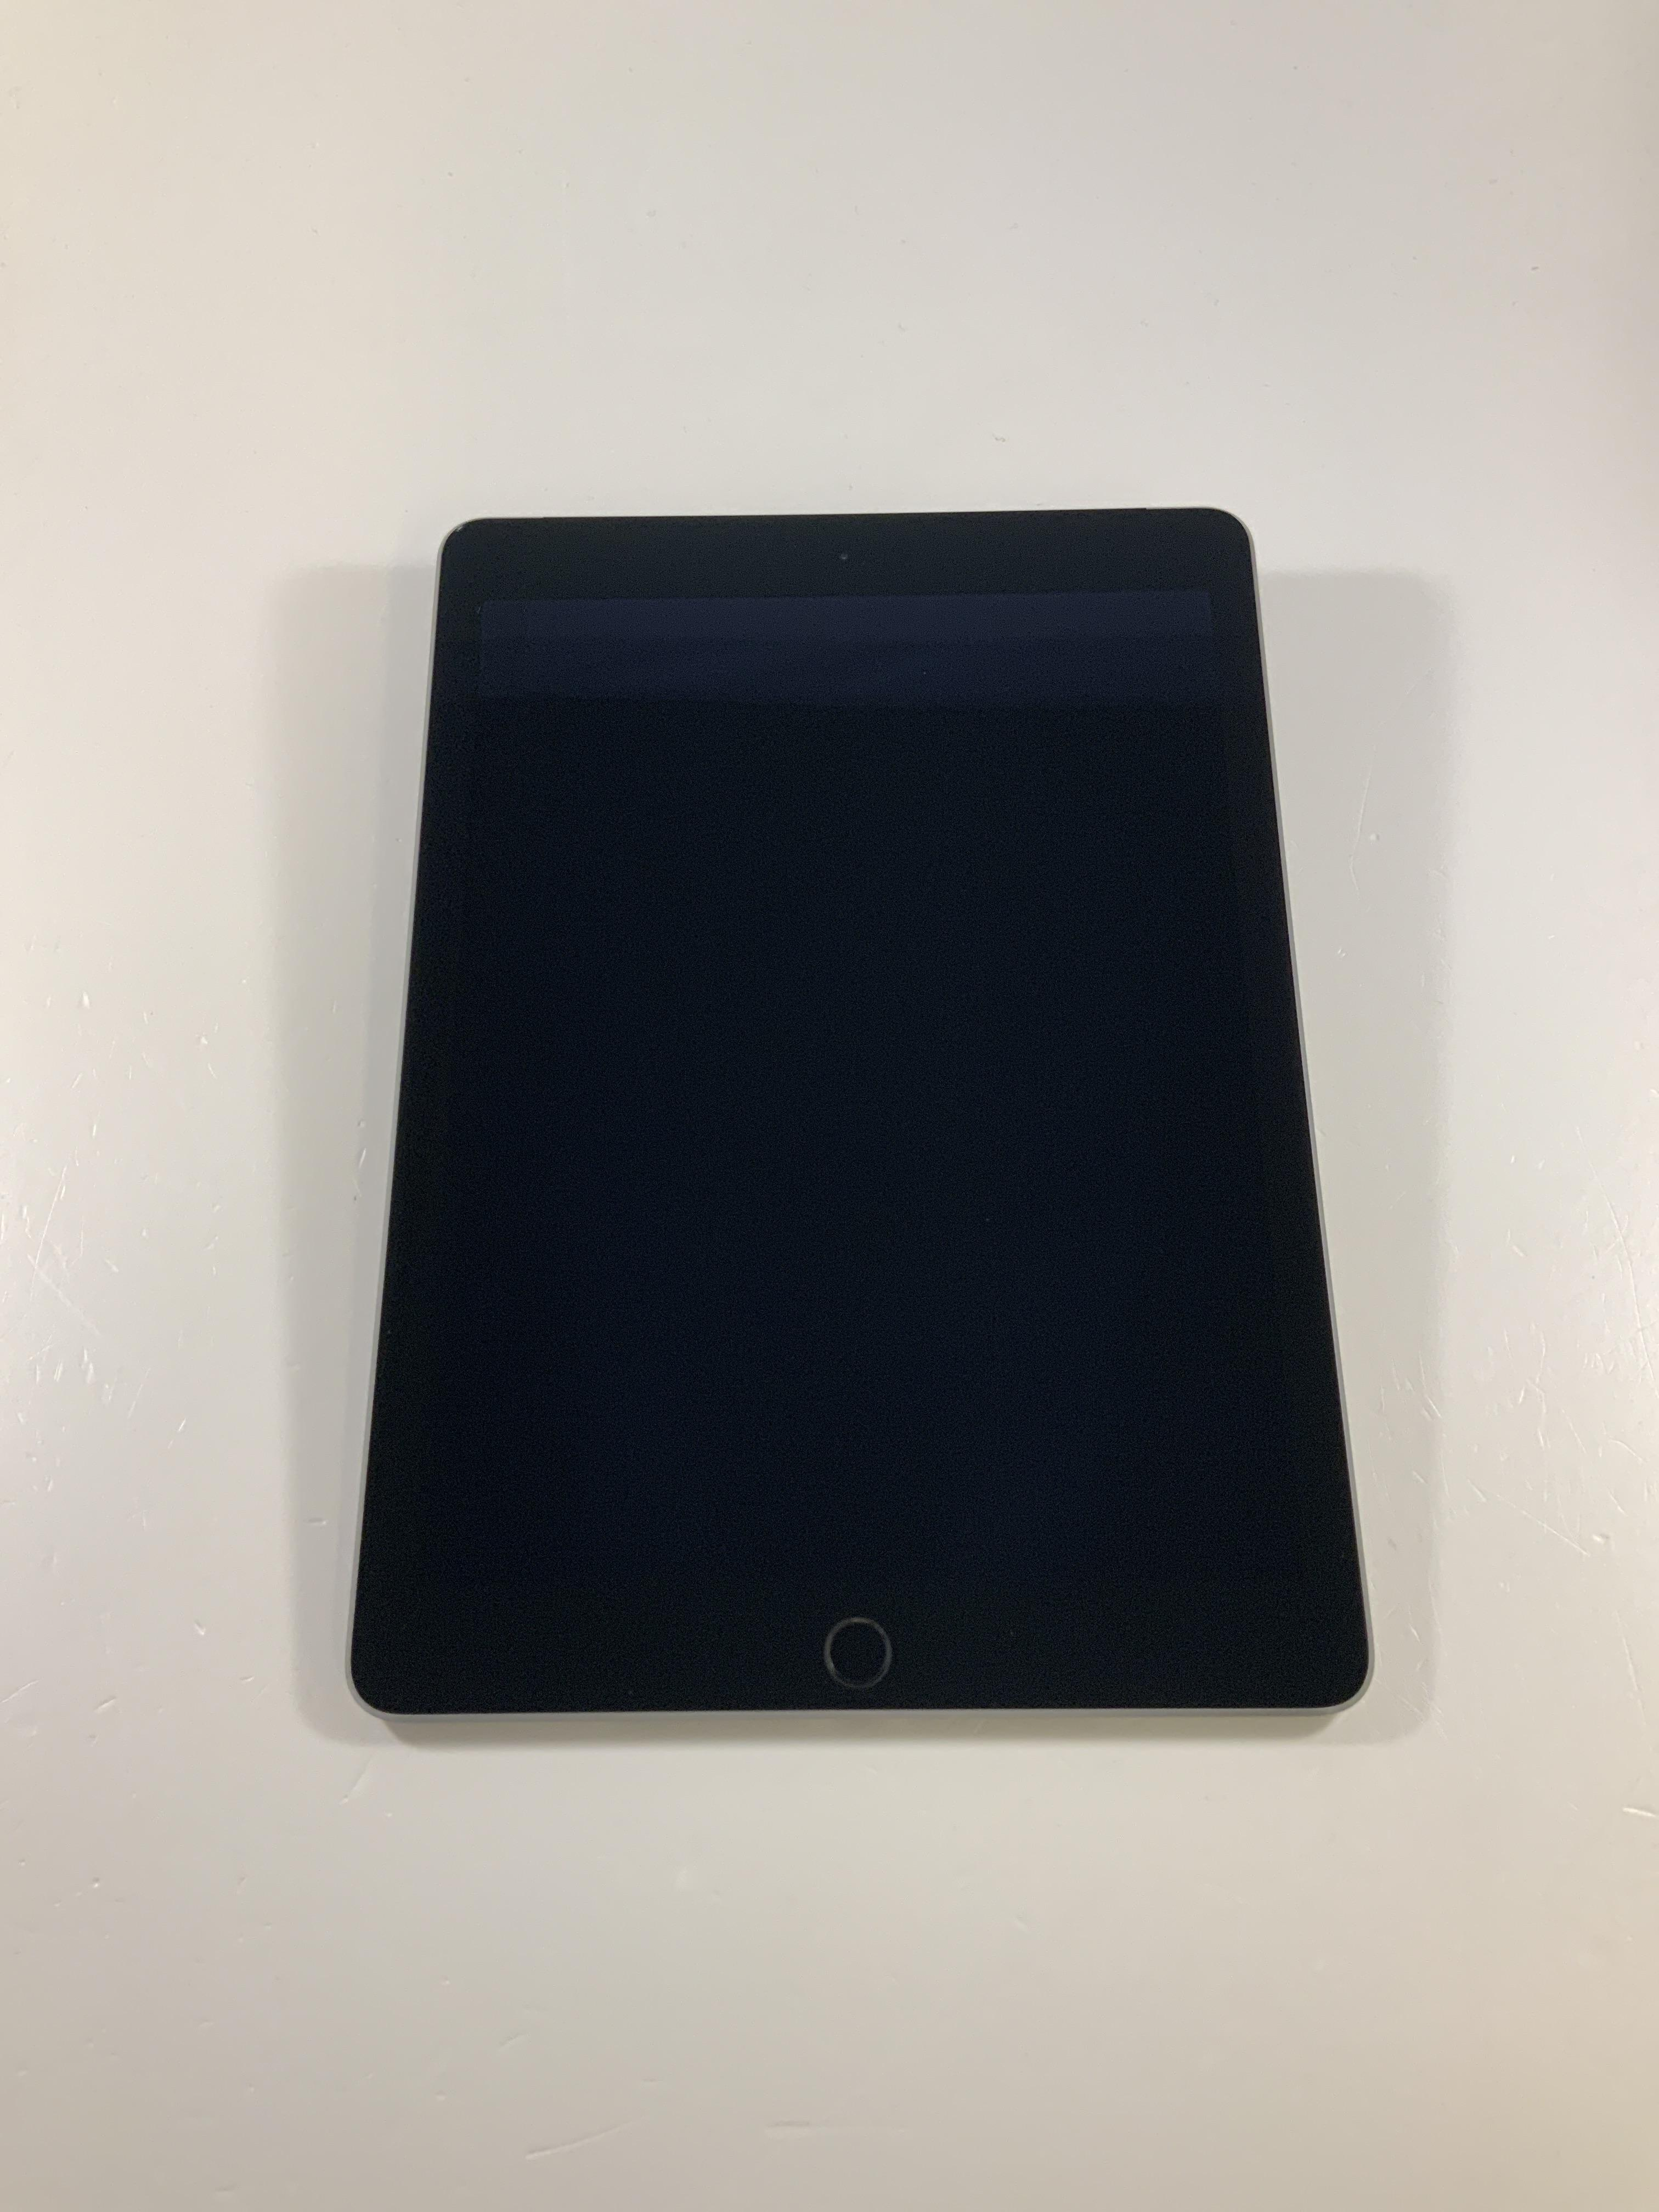 iPad Air 2 Wi-Fi + Cellular 32GB, 32GB, Space Gray, Kuva 1